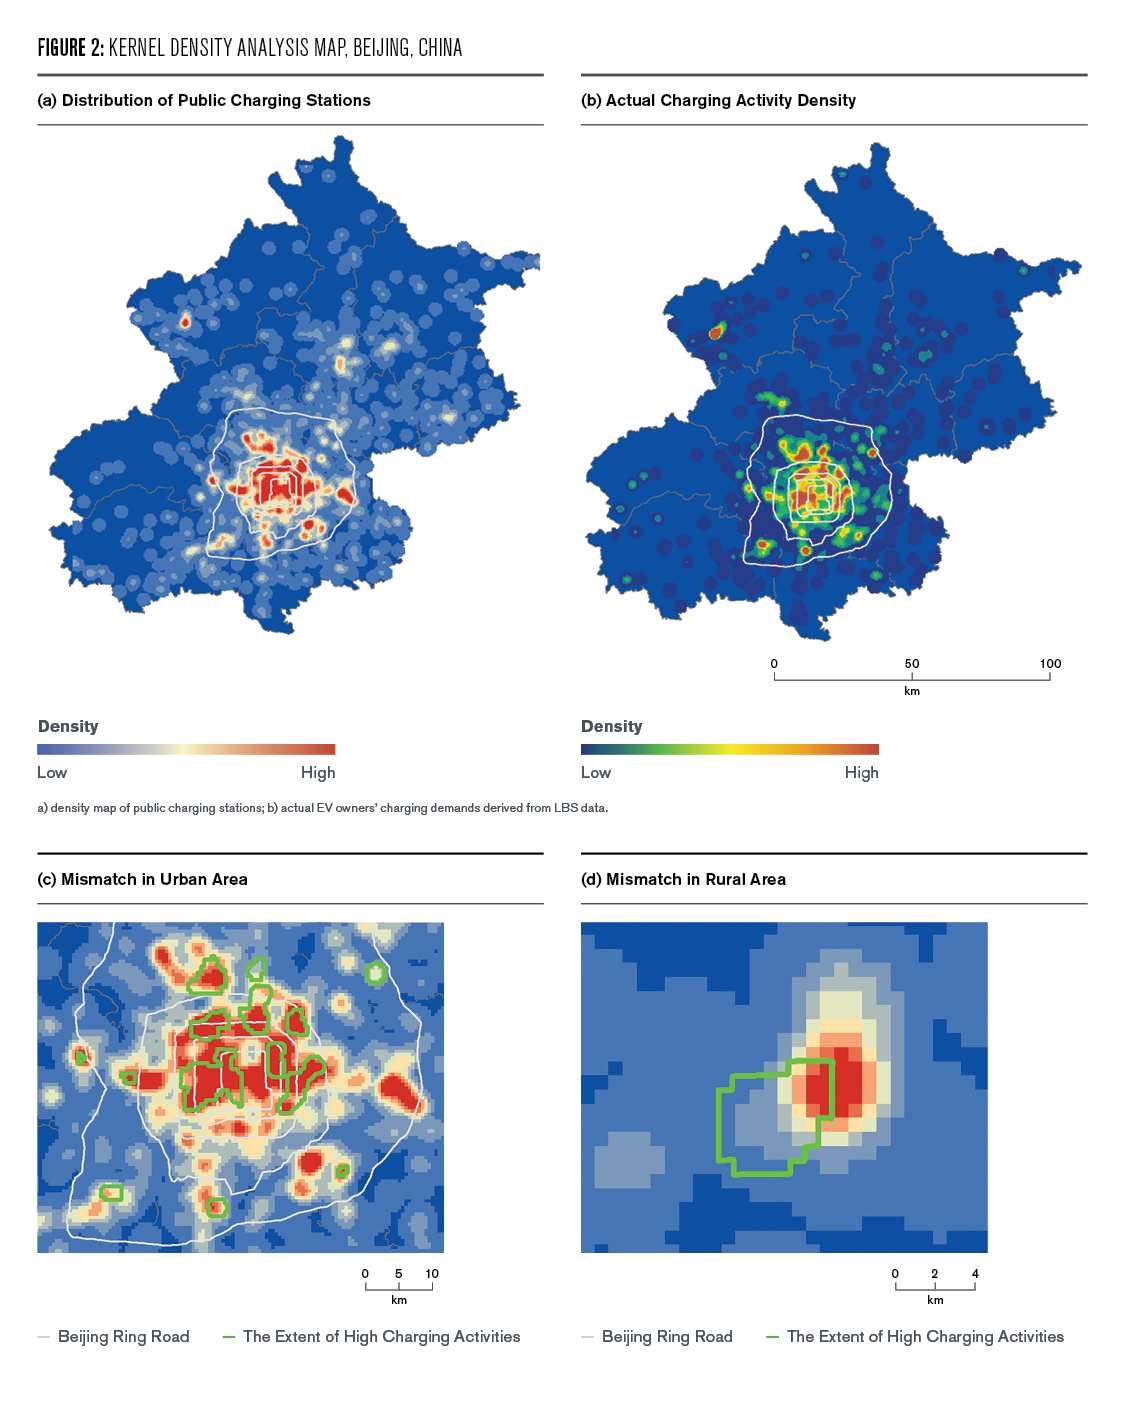 Figure 2: Kernel Density Analysis Map for Beijing China